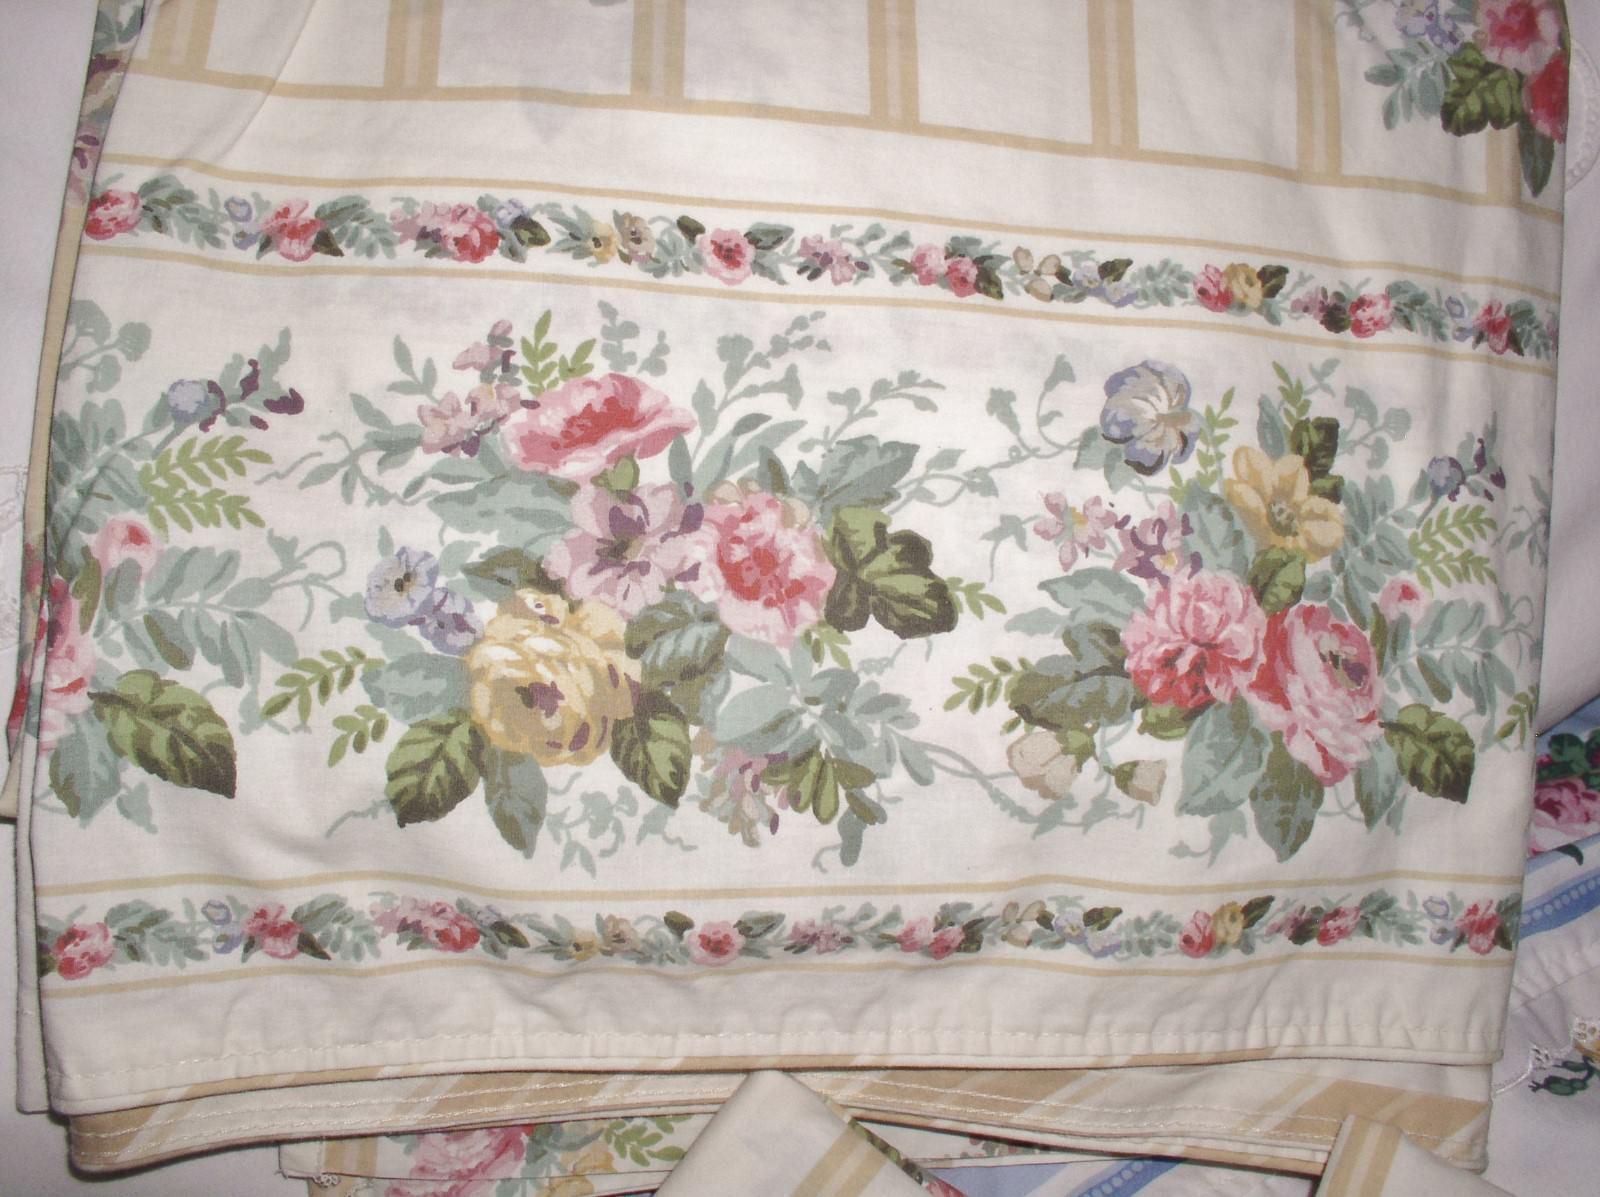 Martex  King Flat Sheet & 2 King Pillowcases  Liberty of London  Floral pinks